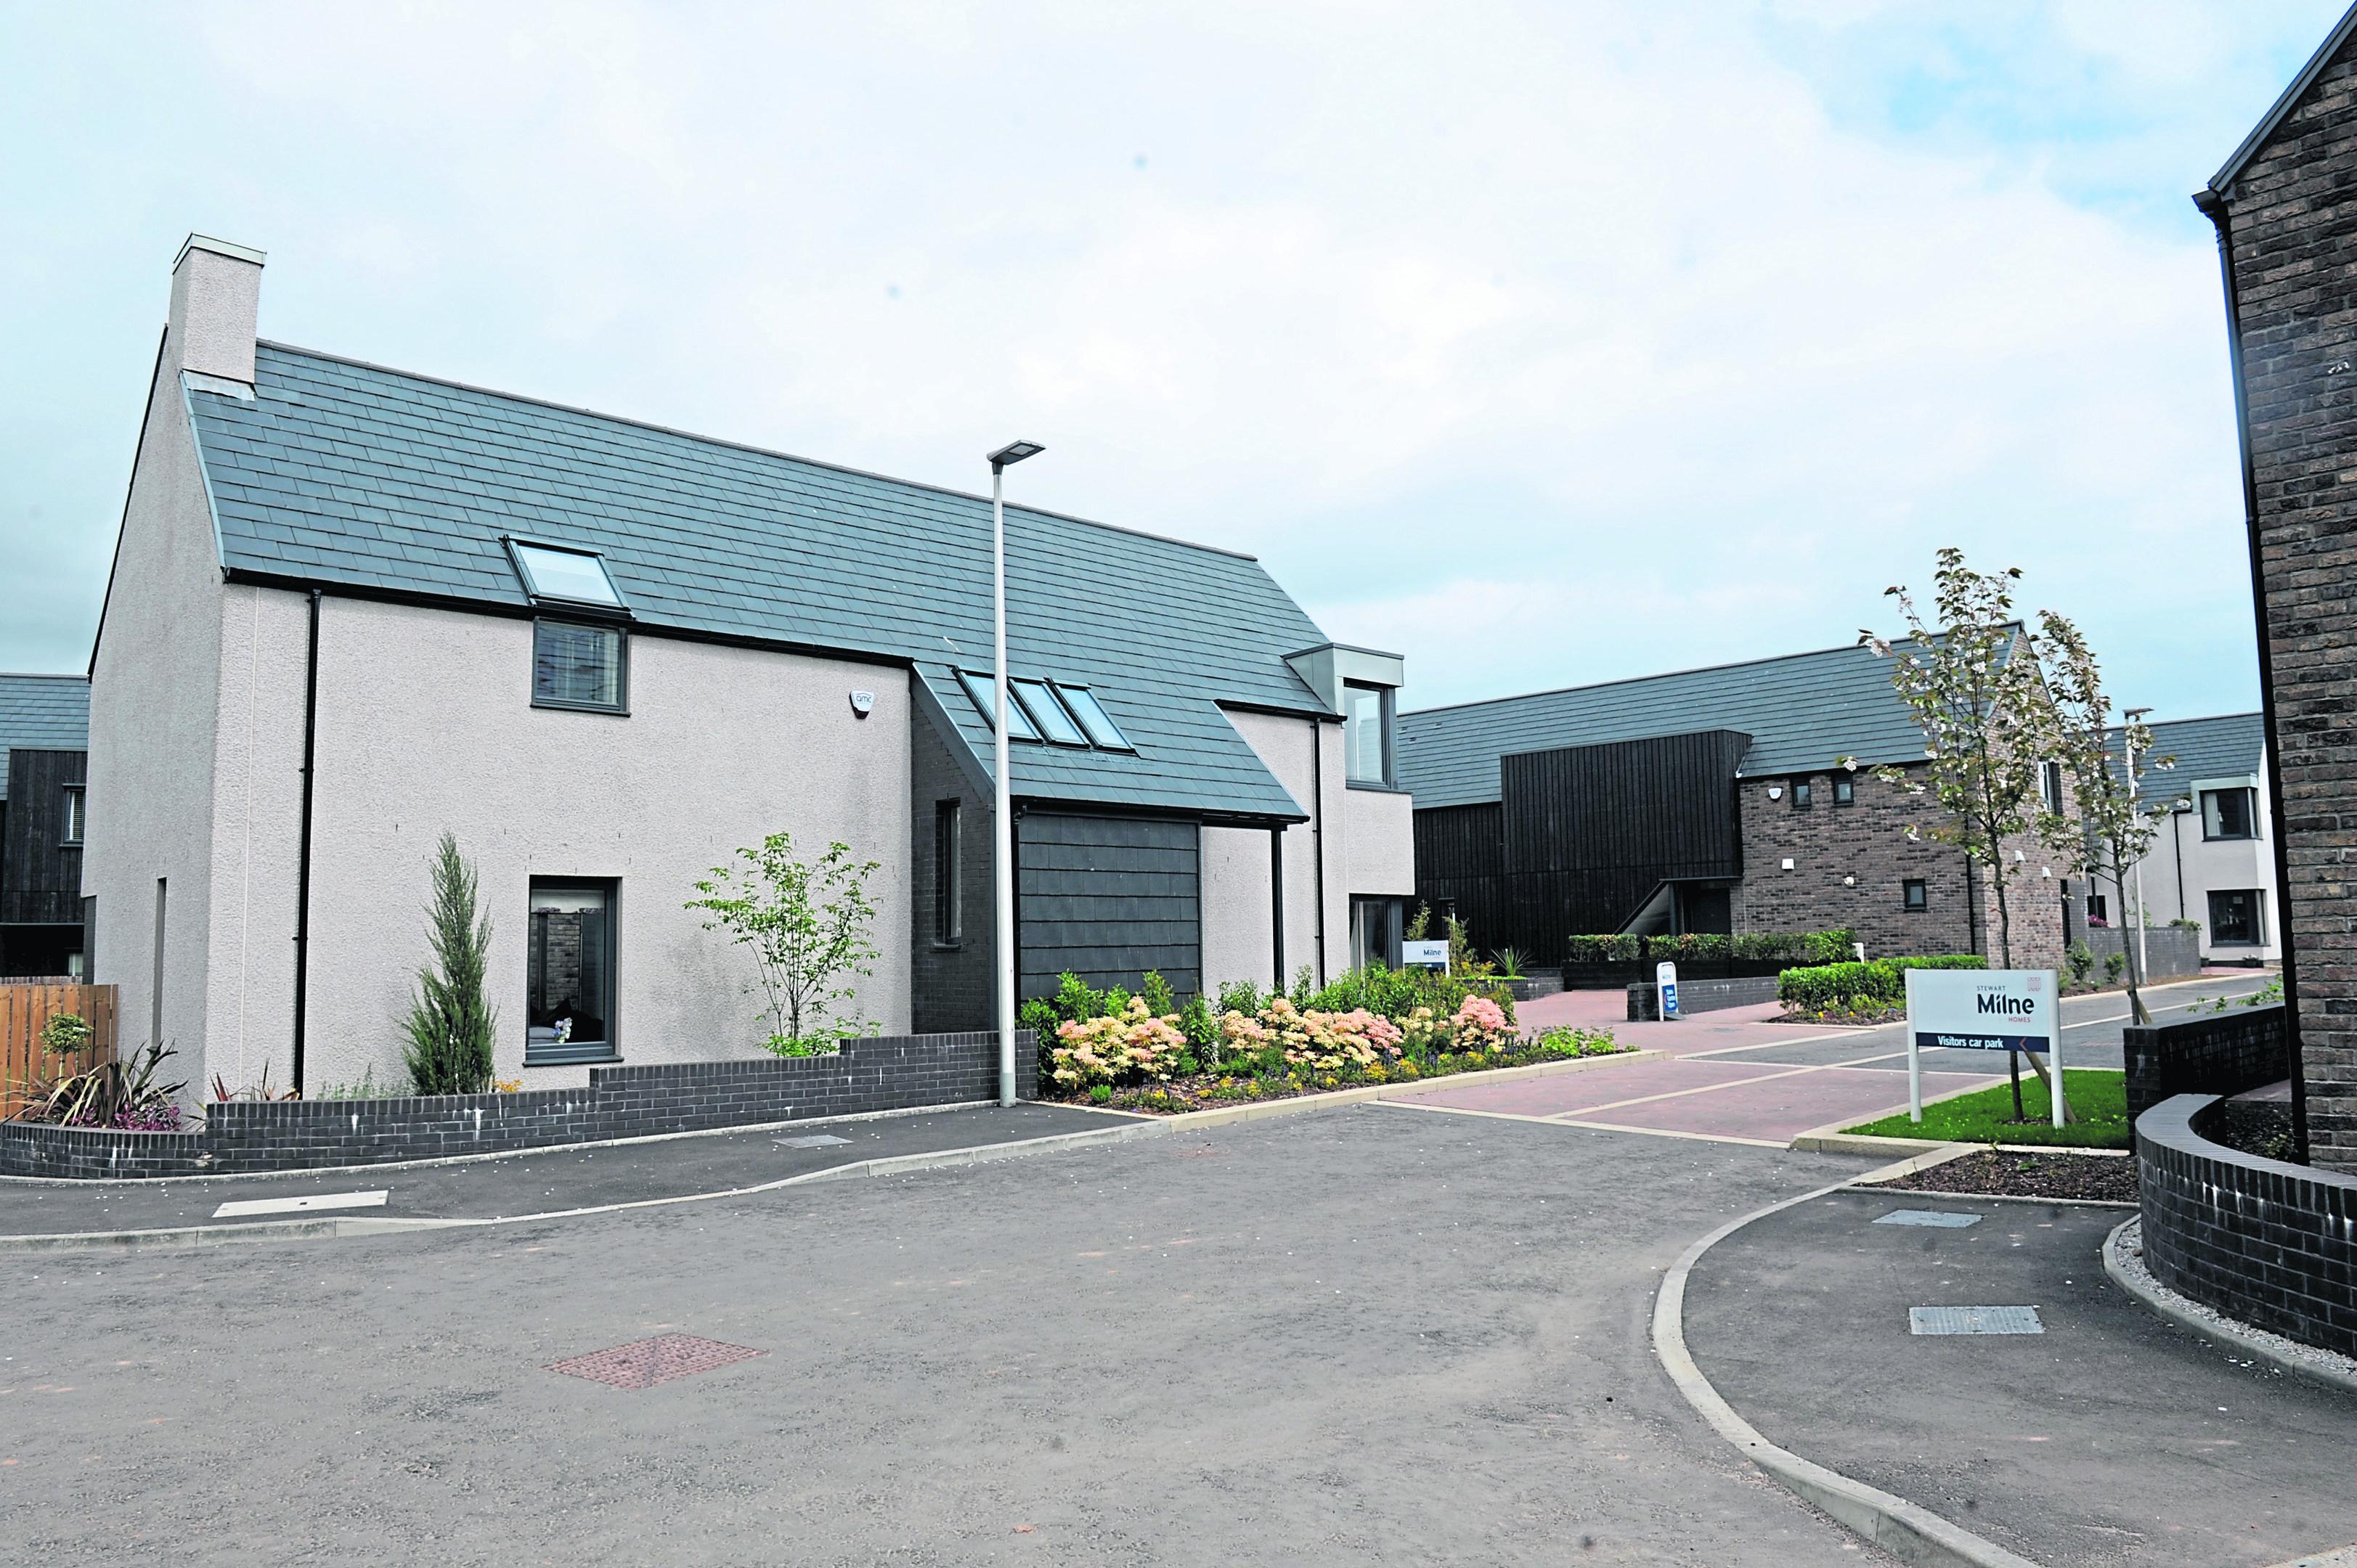 Stewart Milne Homes development of Dunnottar Park.